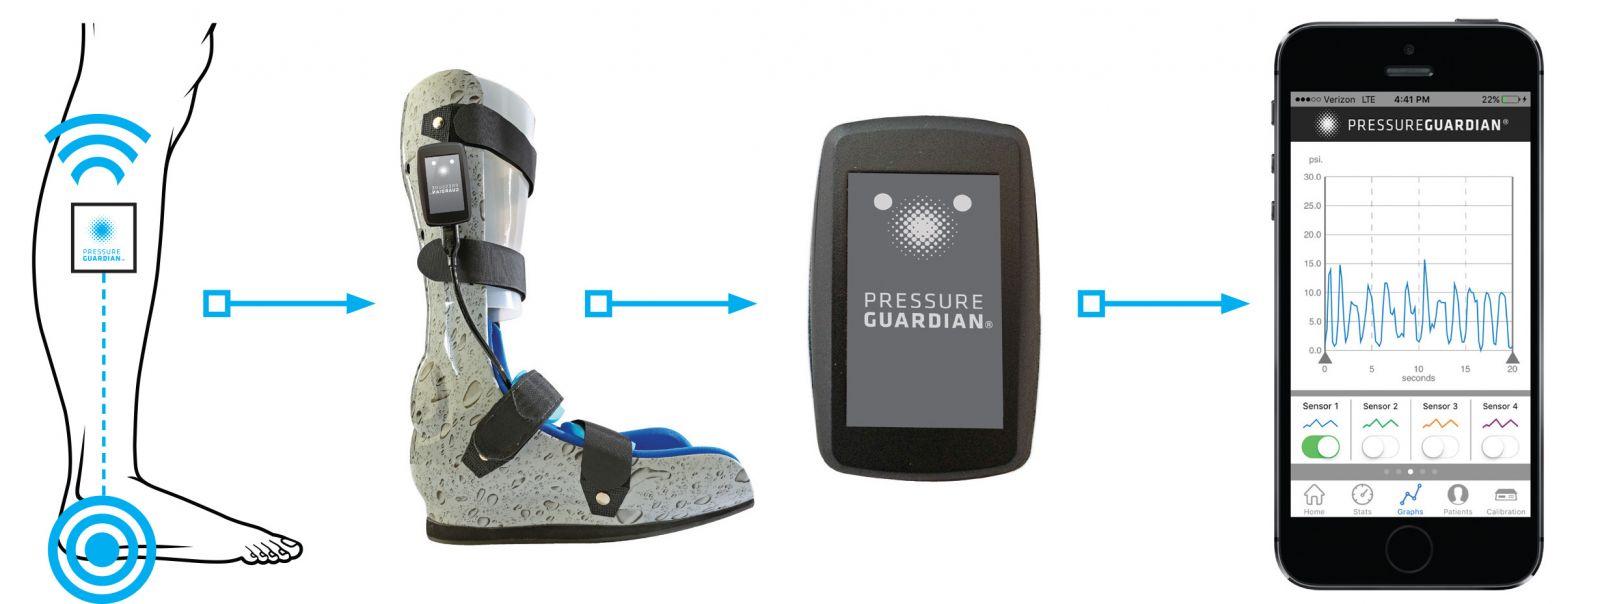 Diabetic Foot Wound Care Goes Digital